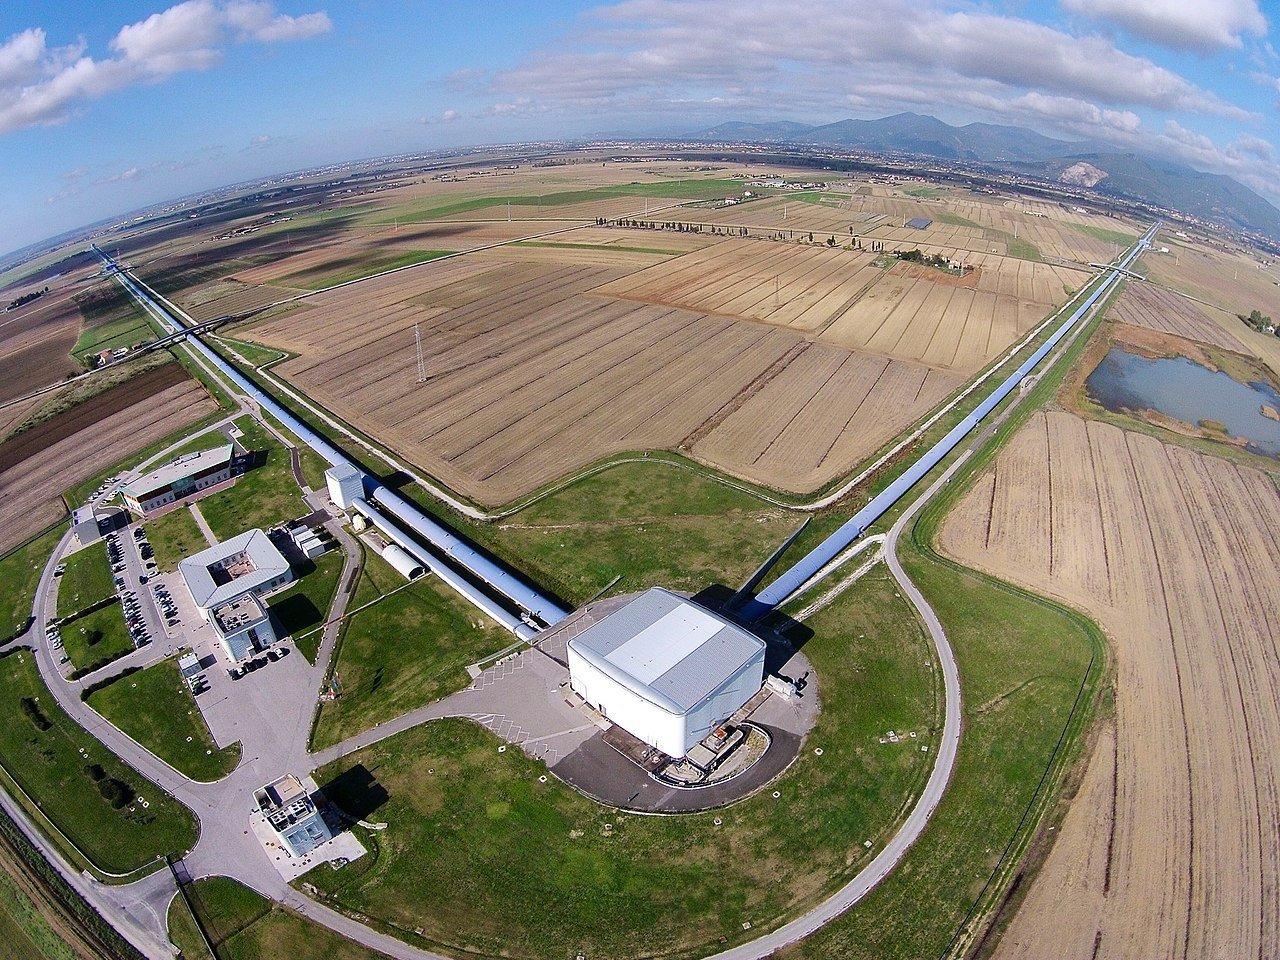 Luftbild des Virgo-Gravitationswellendetektors